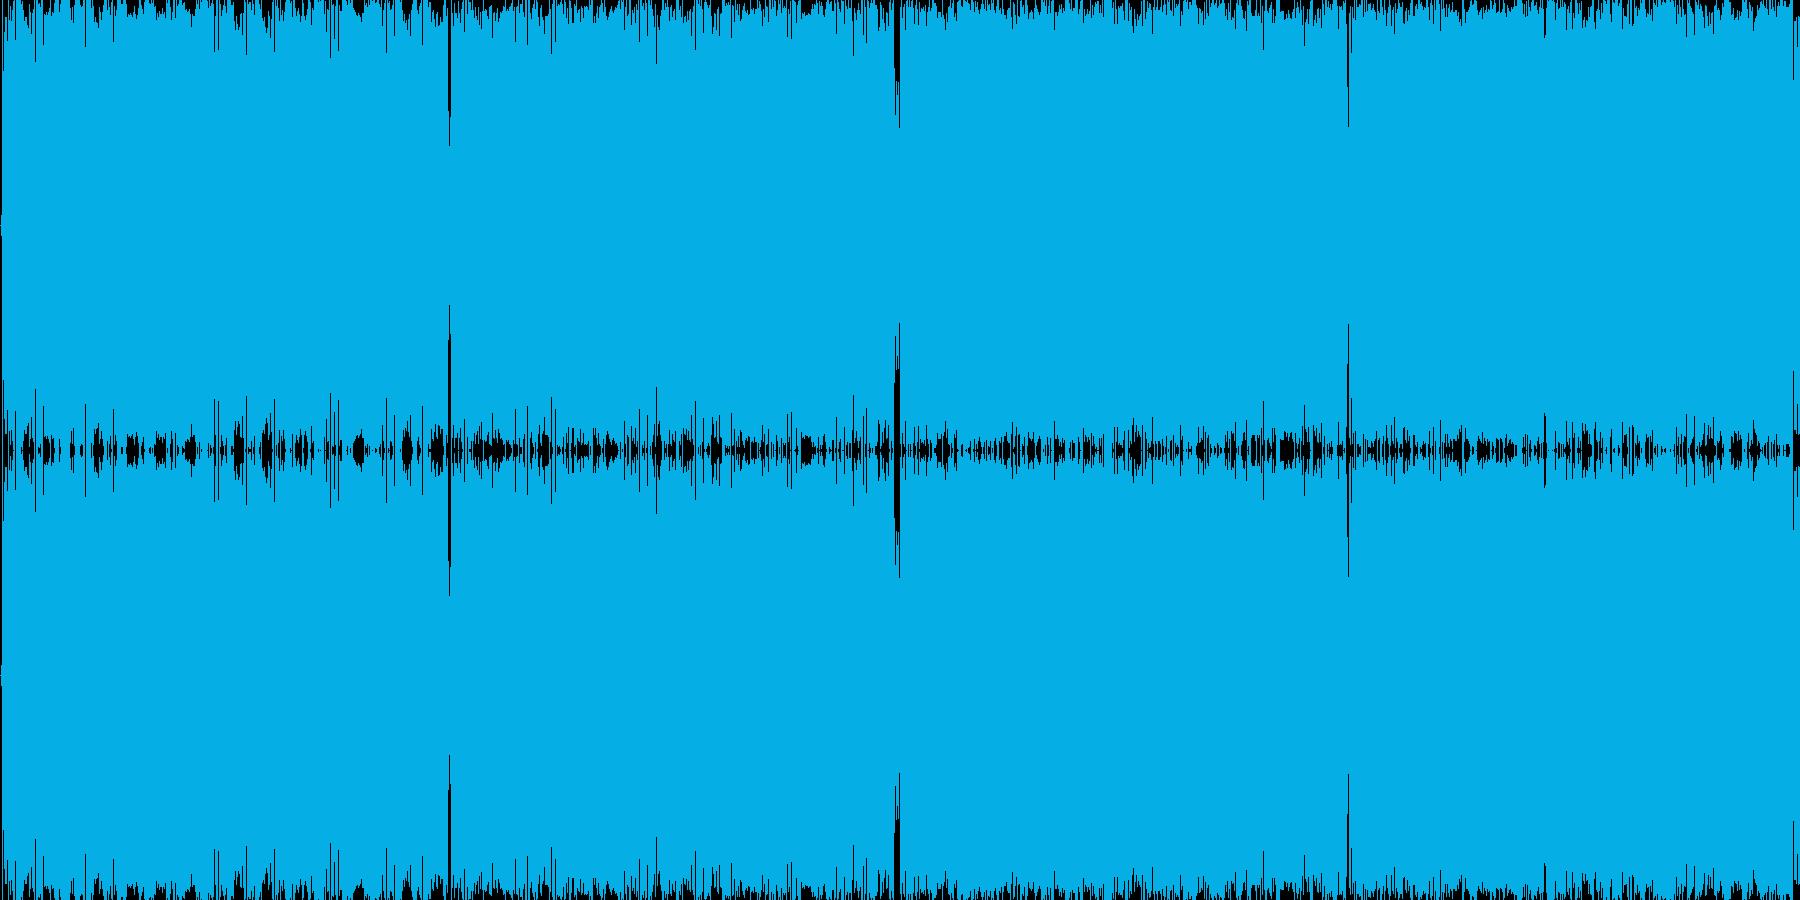 8bit音のみで作ったシンプルピコピコ…の再生済みの波形